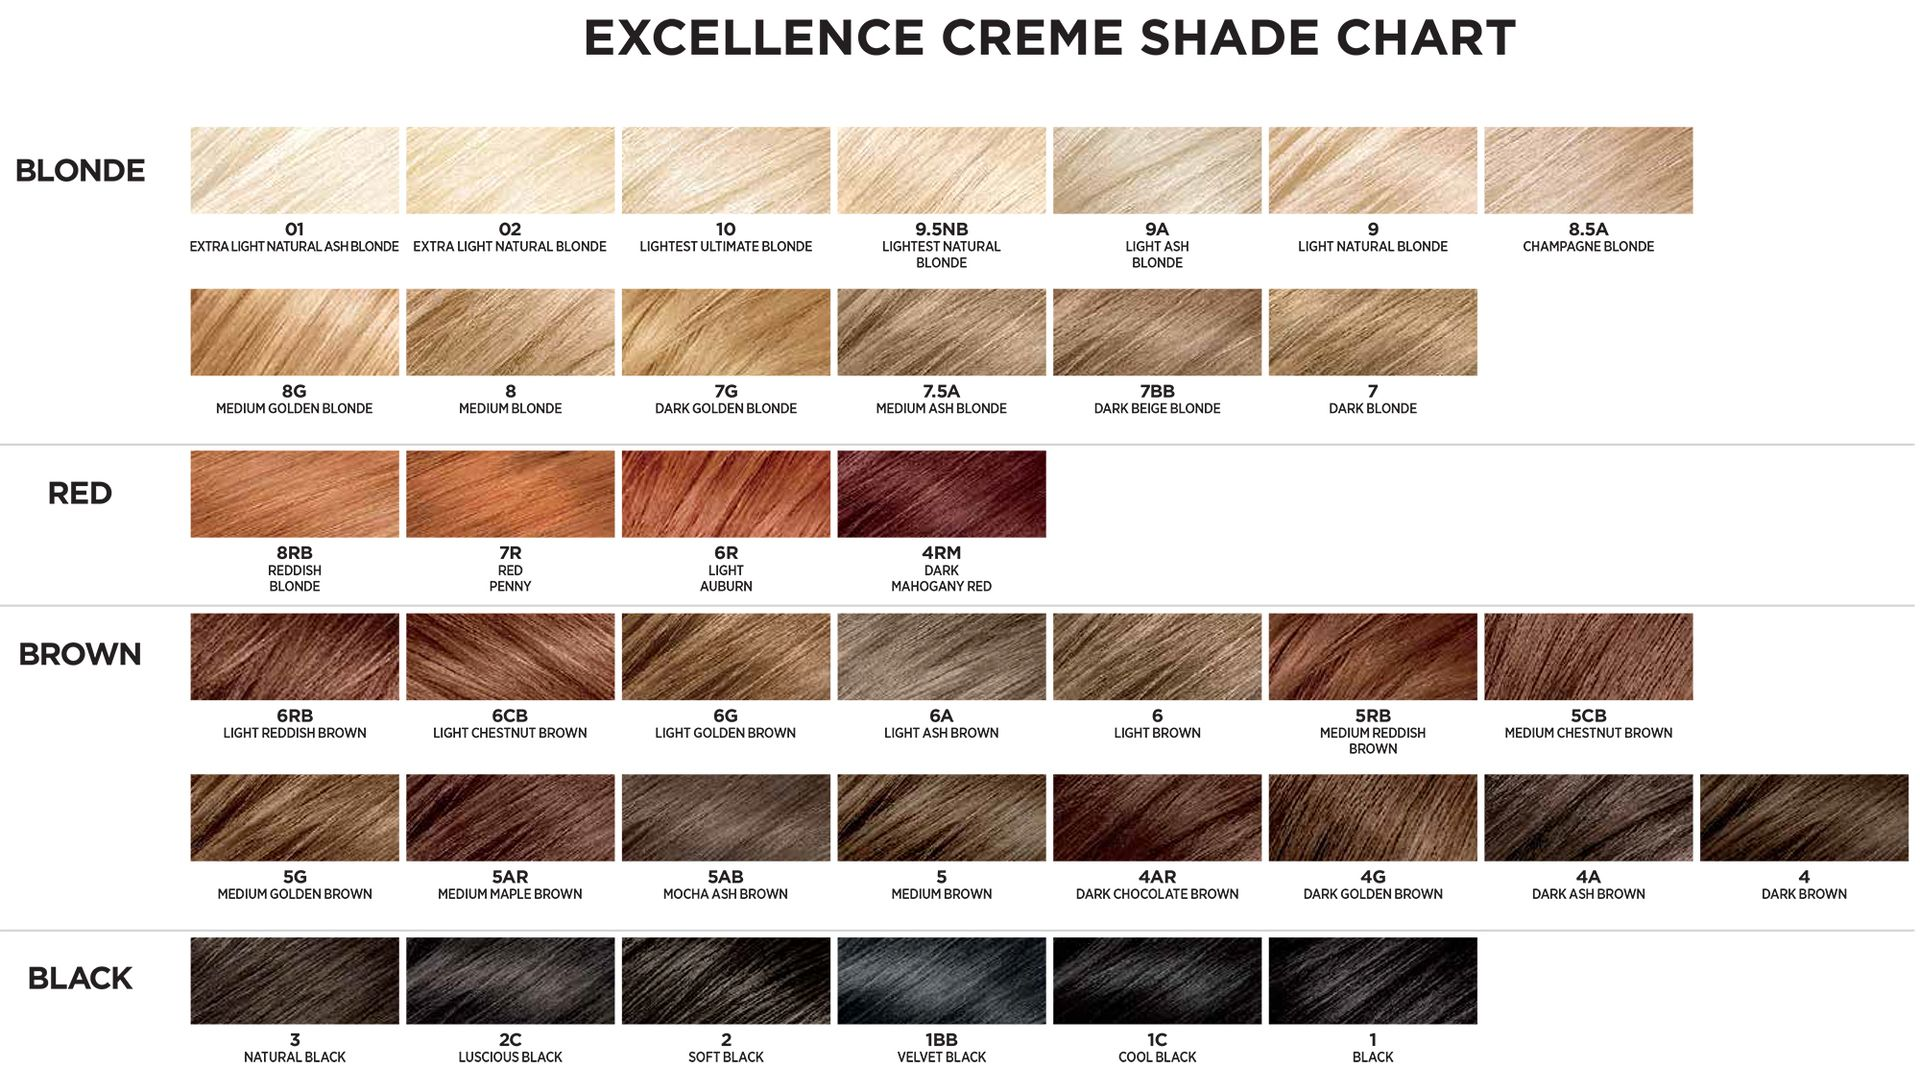 Aveda Hair Color Chart Full Spectrum In 2020 Hair Color Chart Loreal Hair Hair Color Dark